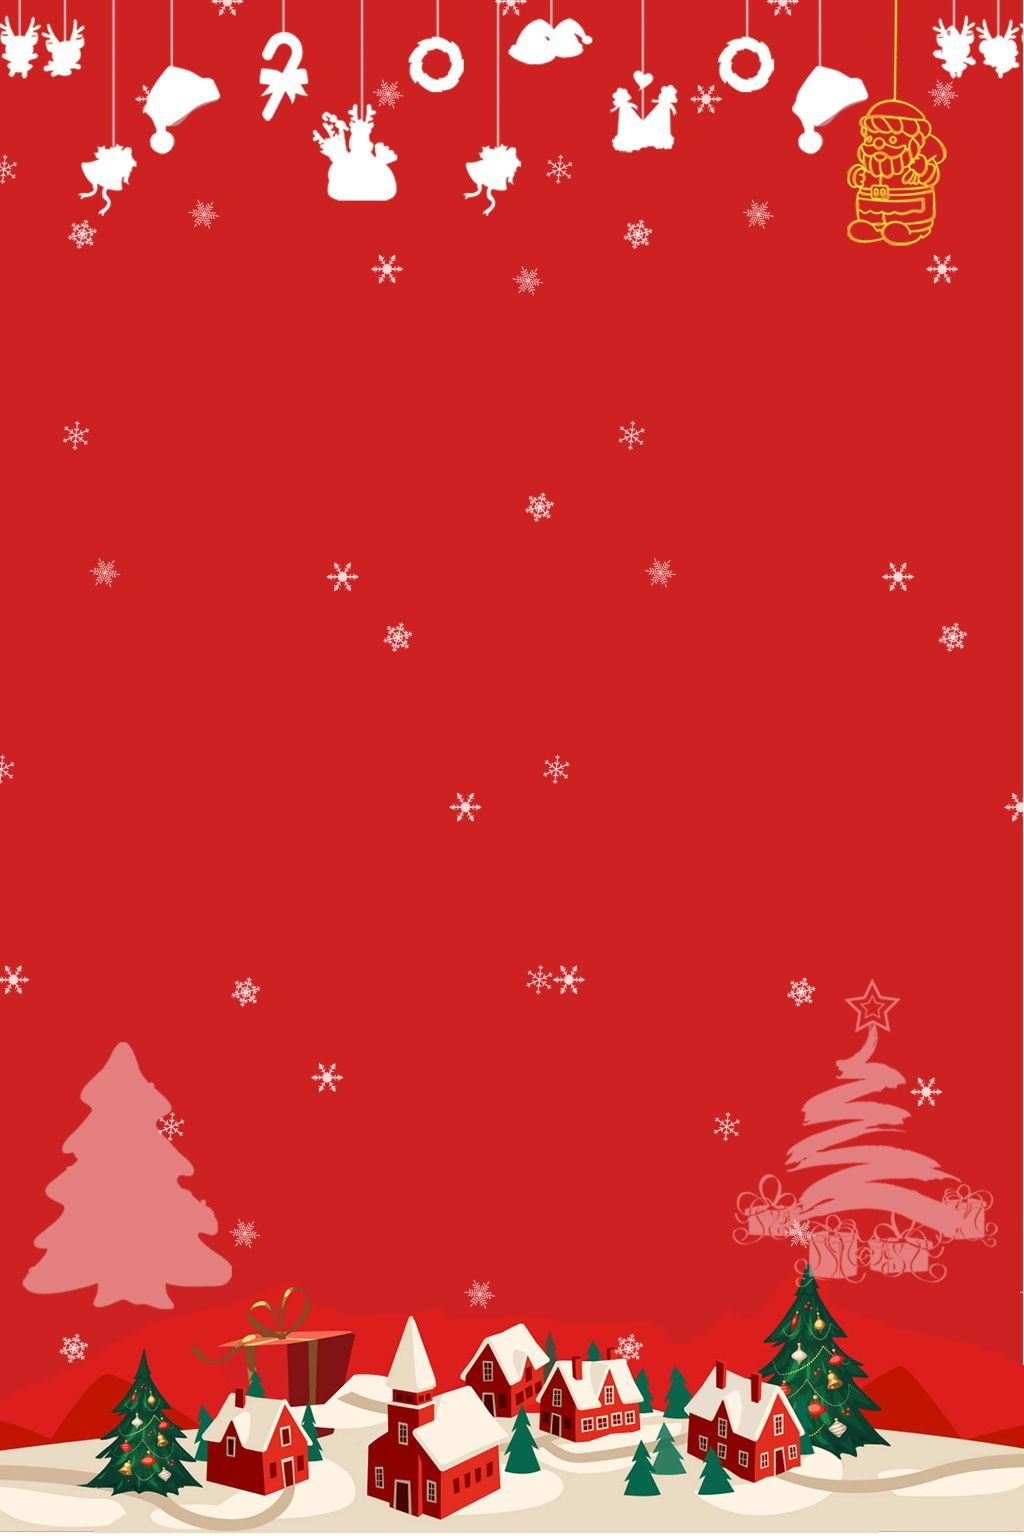 Christmas Background Psd Cute Christmas Backgrounds Cute Christmas Wallpaper Christmas Background